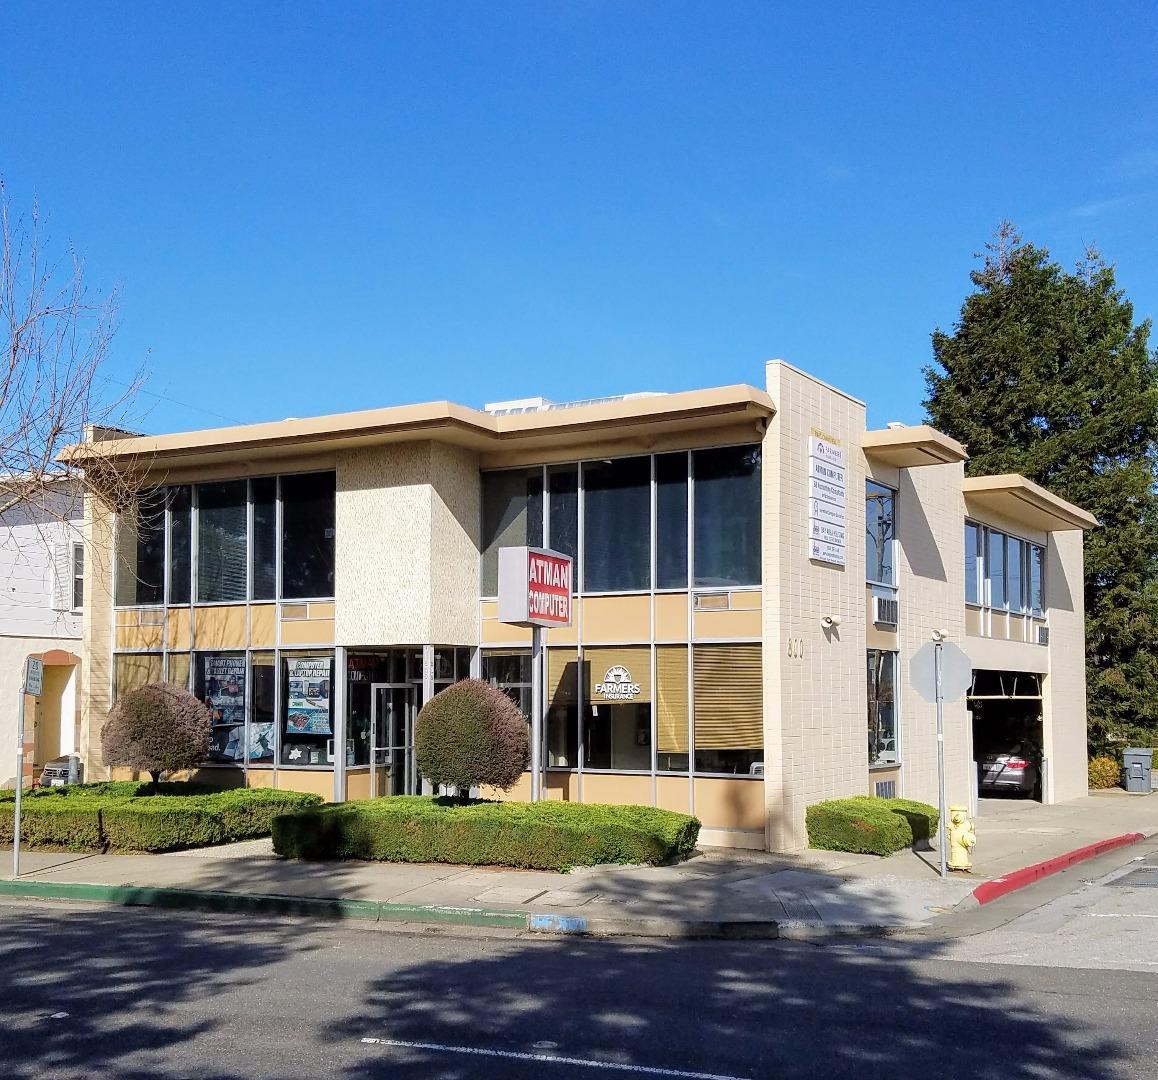 800 El Camino Real, MILLBRAE, CA 94030